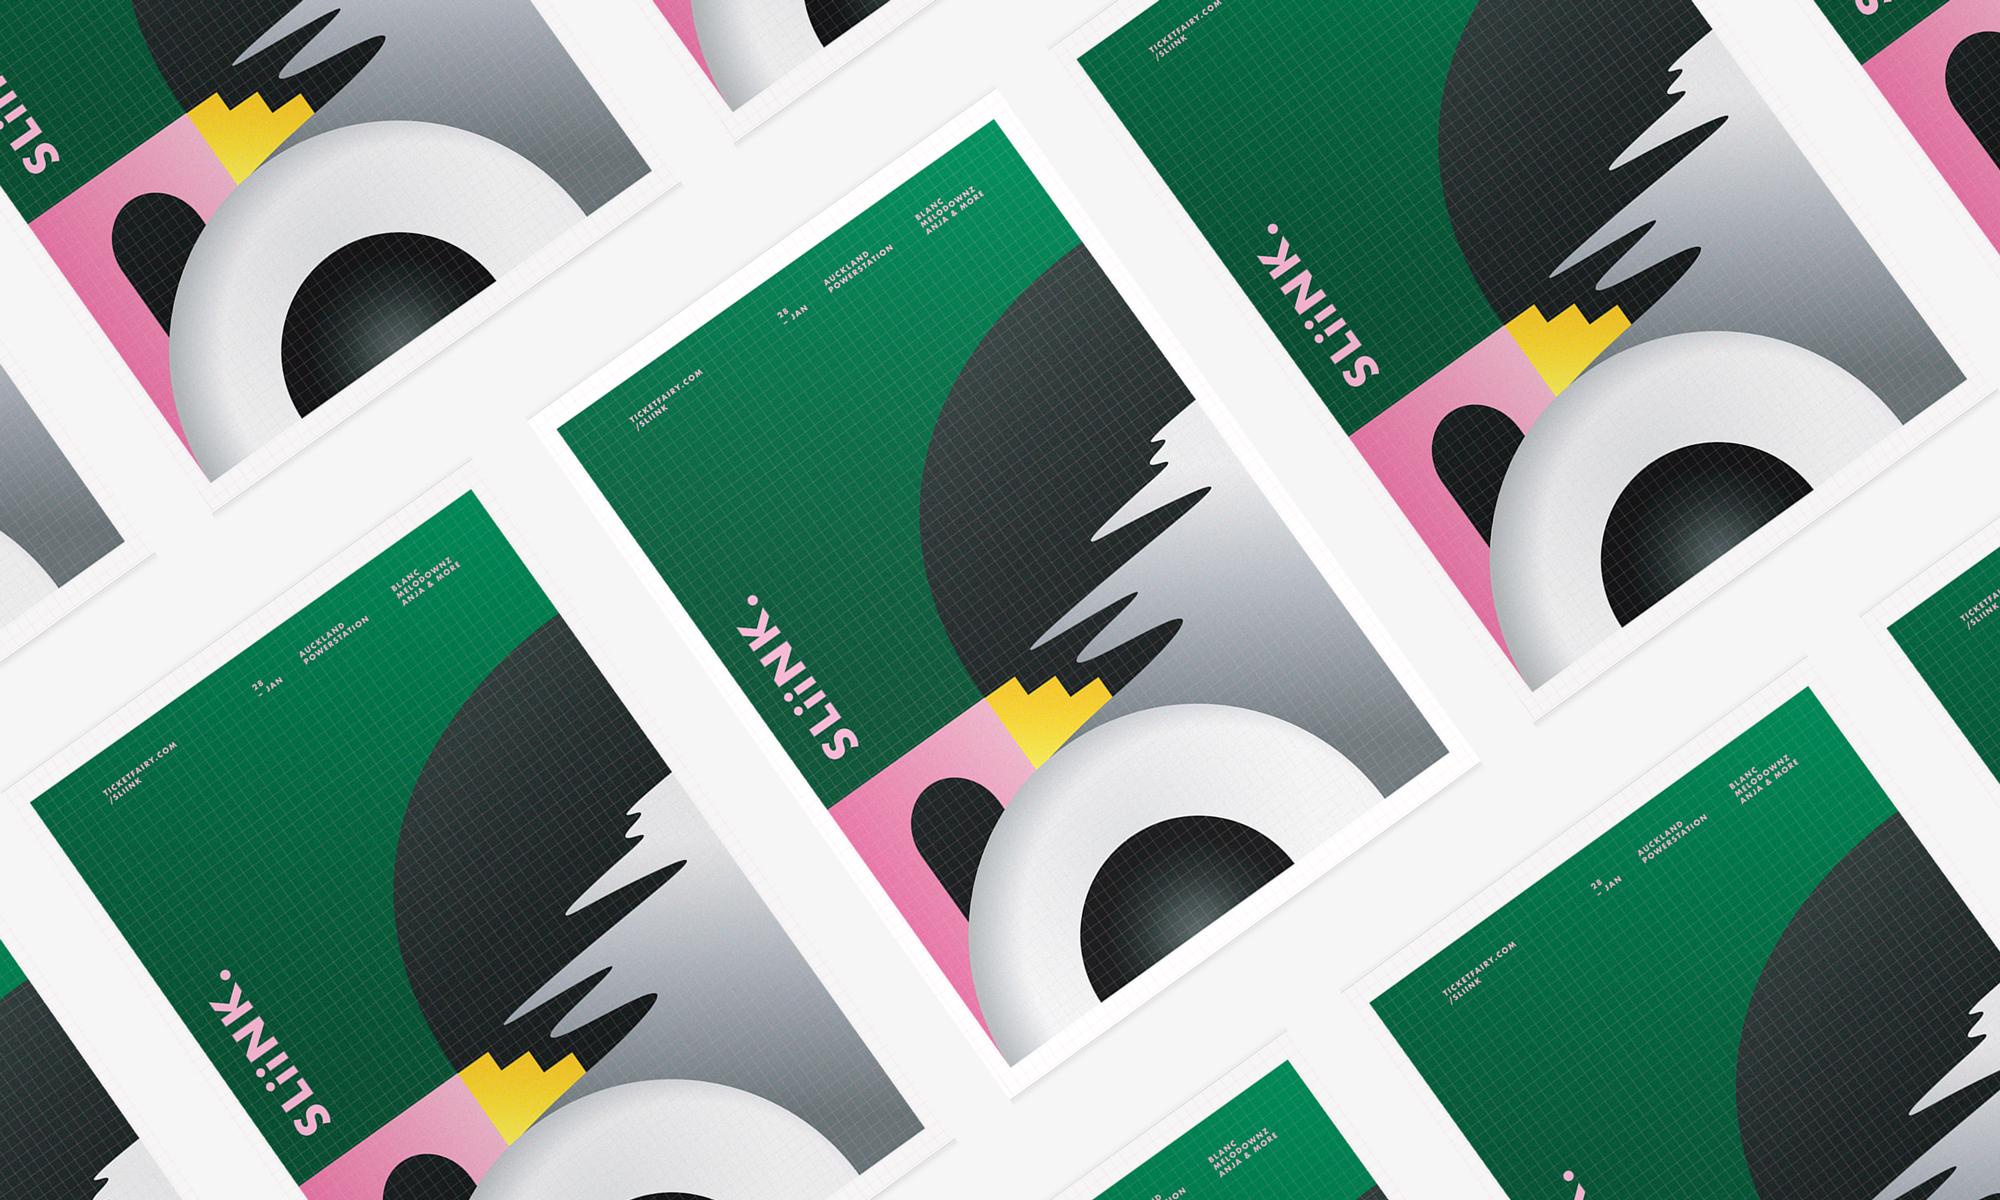 Branding-PSD-Poster-Mockup-Design-For-Designers